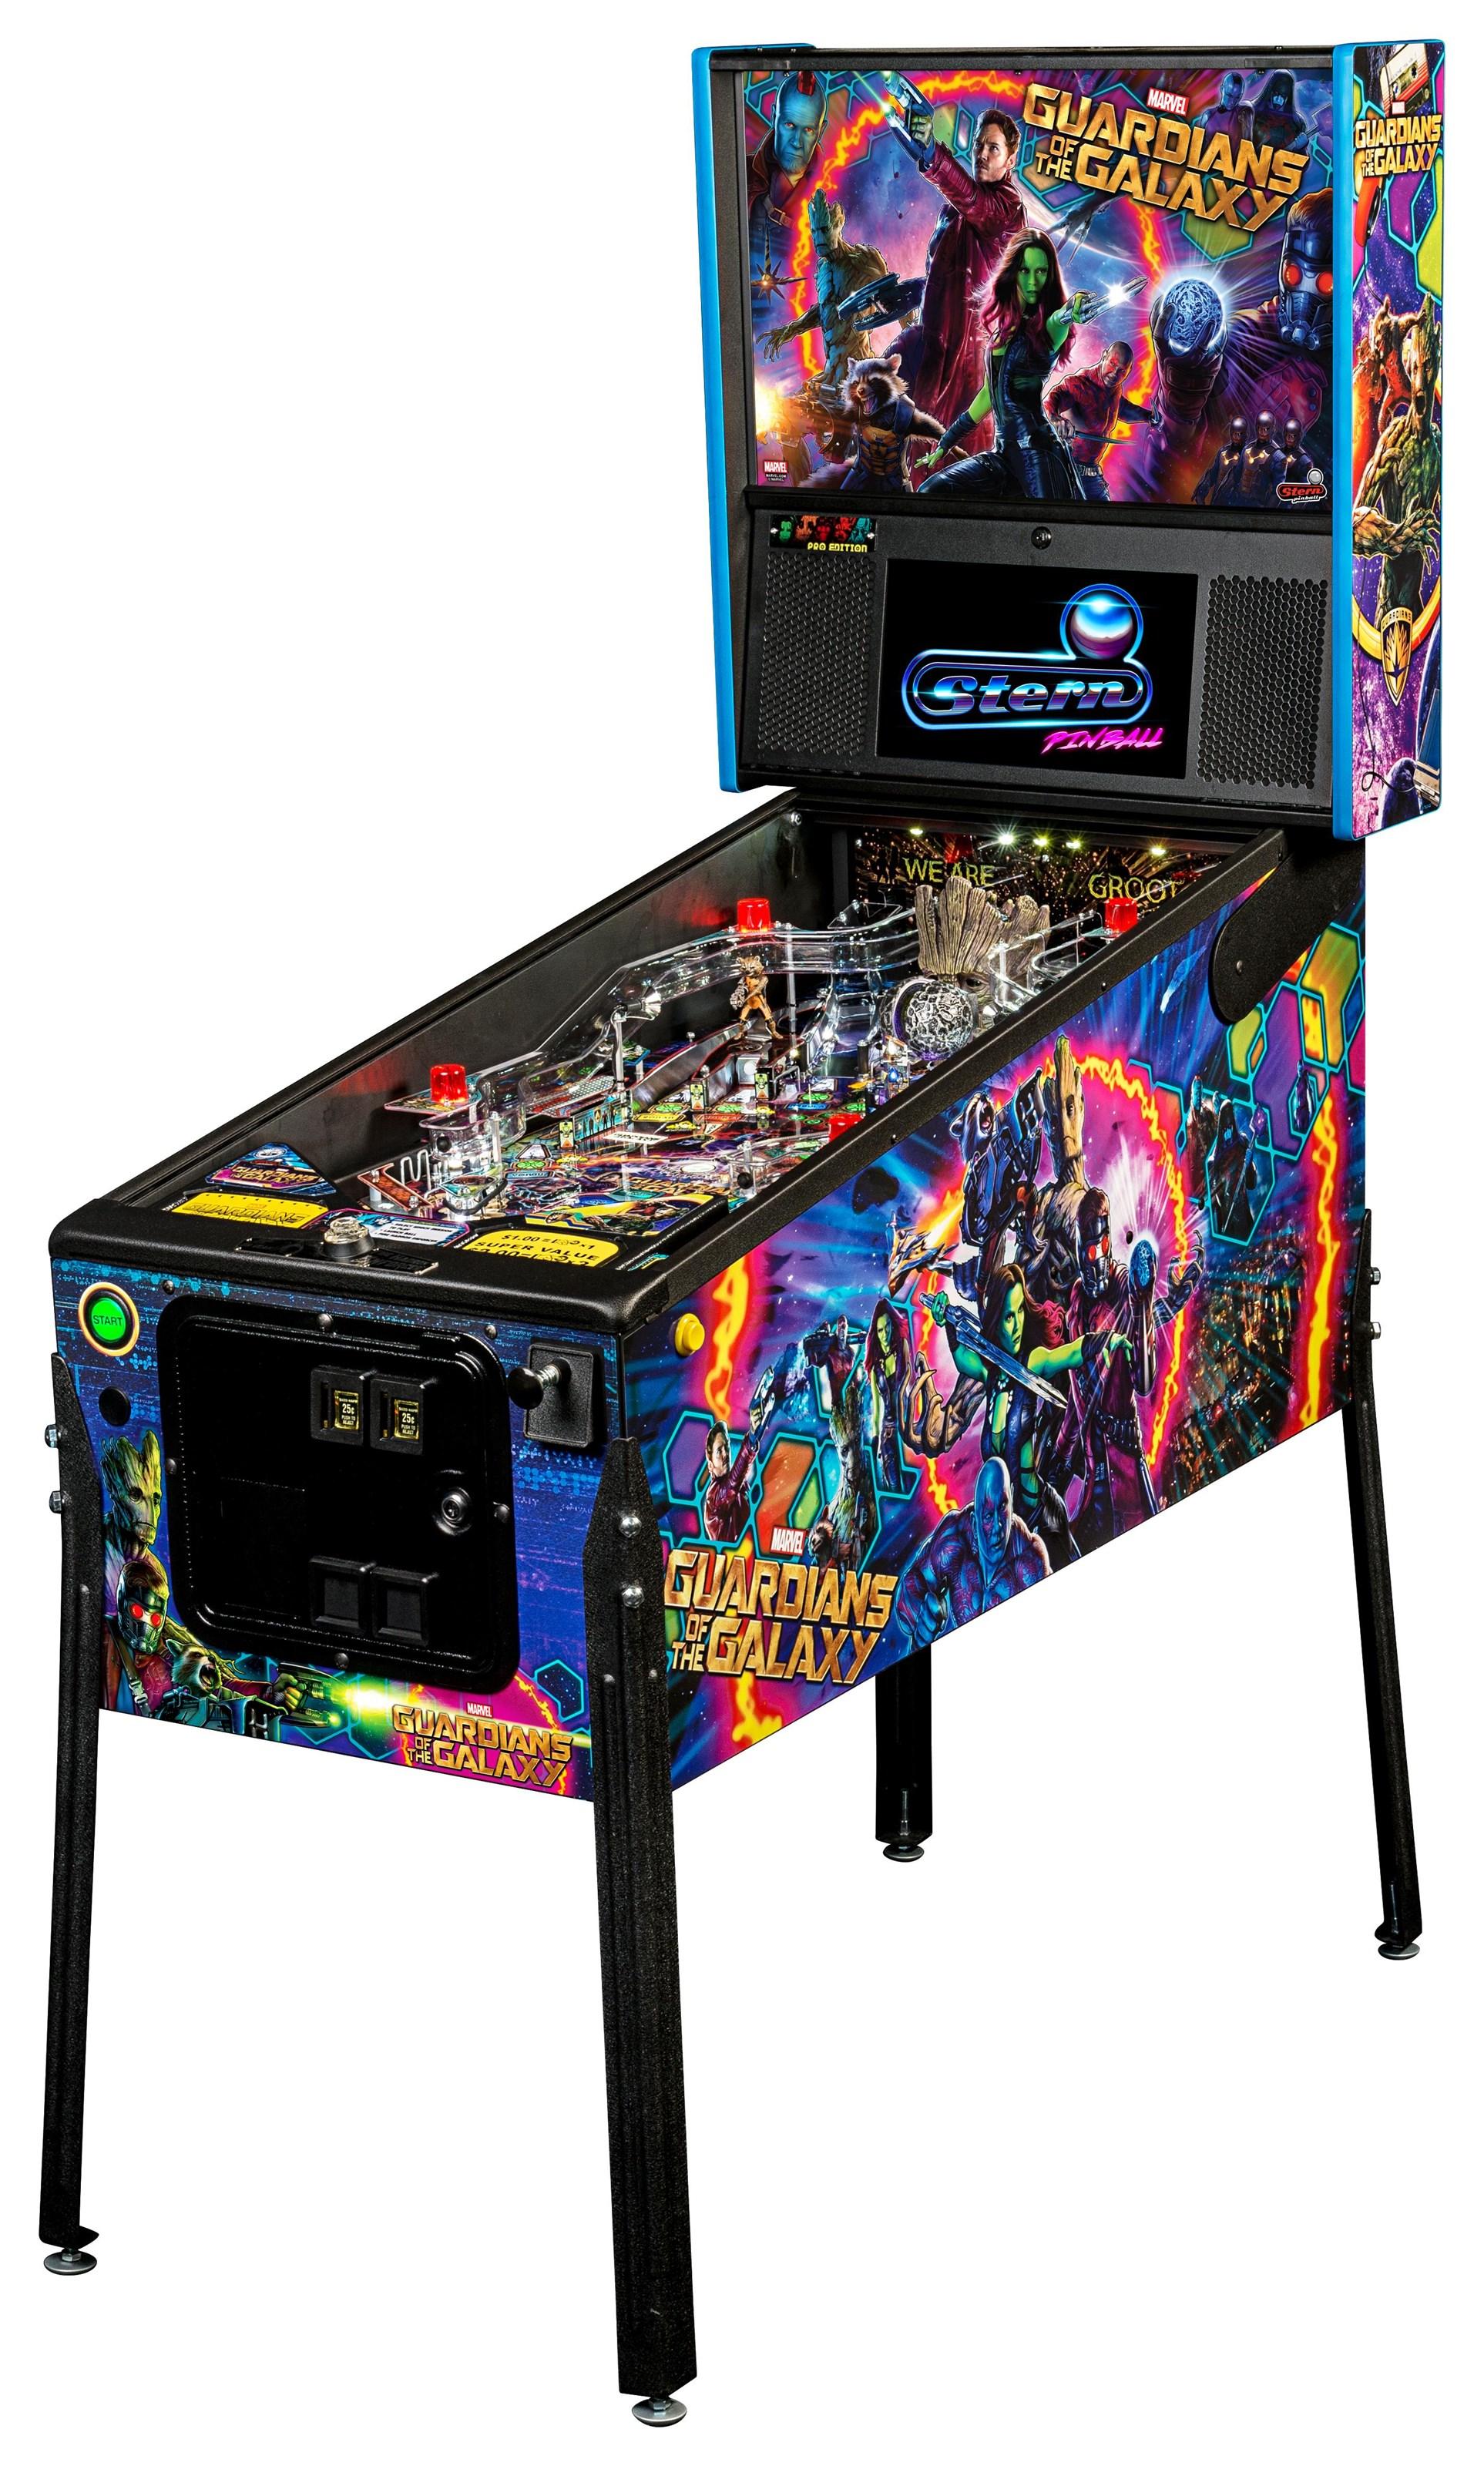 Games Guardians Of The Galaxy Pitball Machine by Stern Pinball at Johnny Janosik